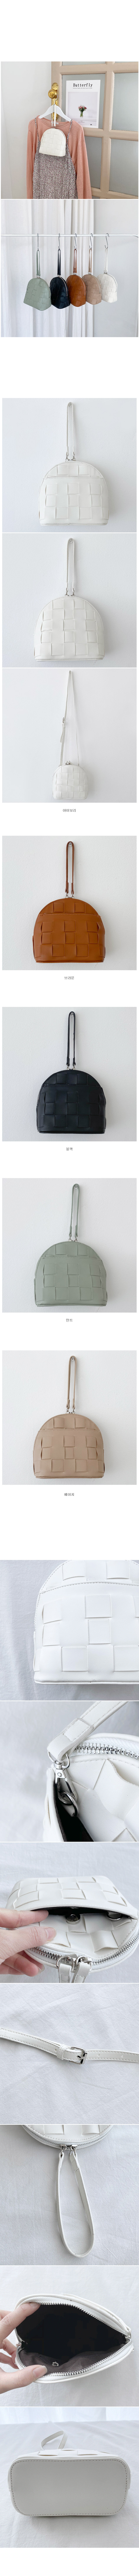 Cleddy Mini Bag